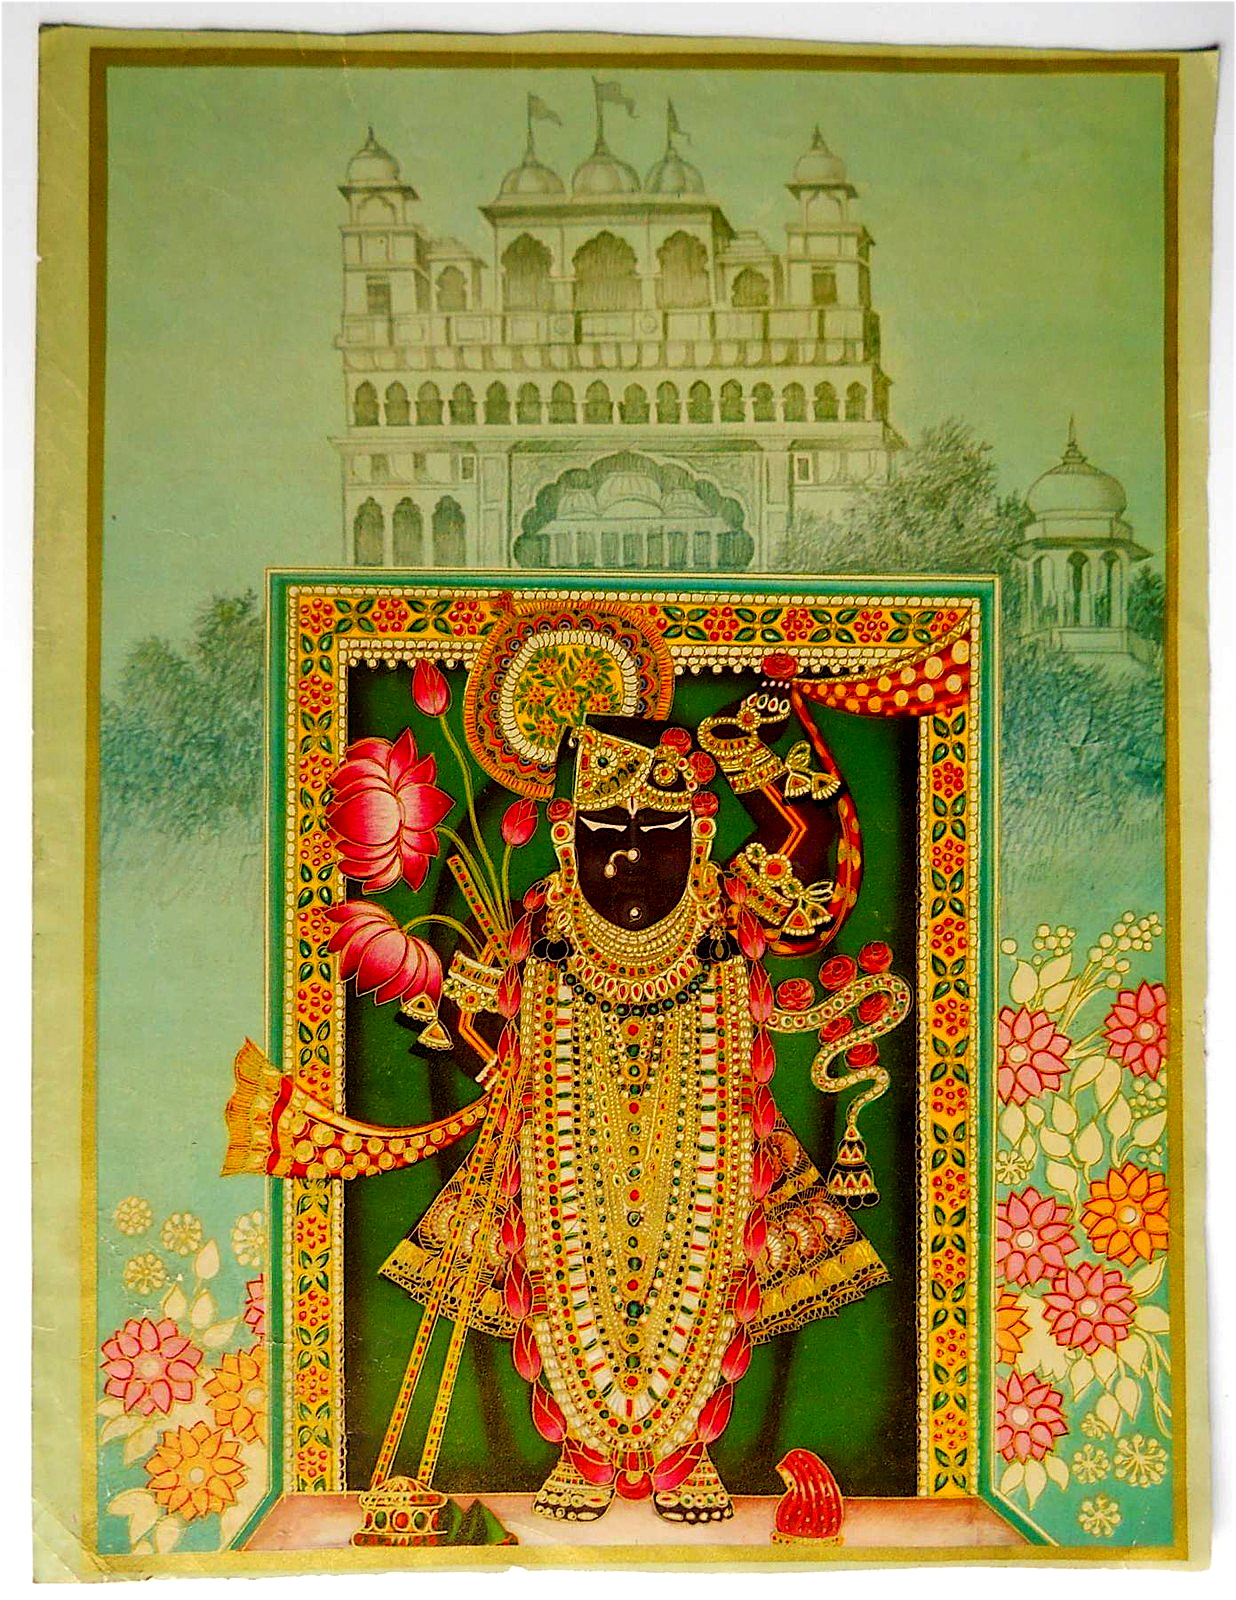 Calendar Art : Shrinathji calendar art found out